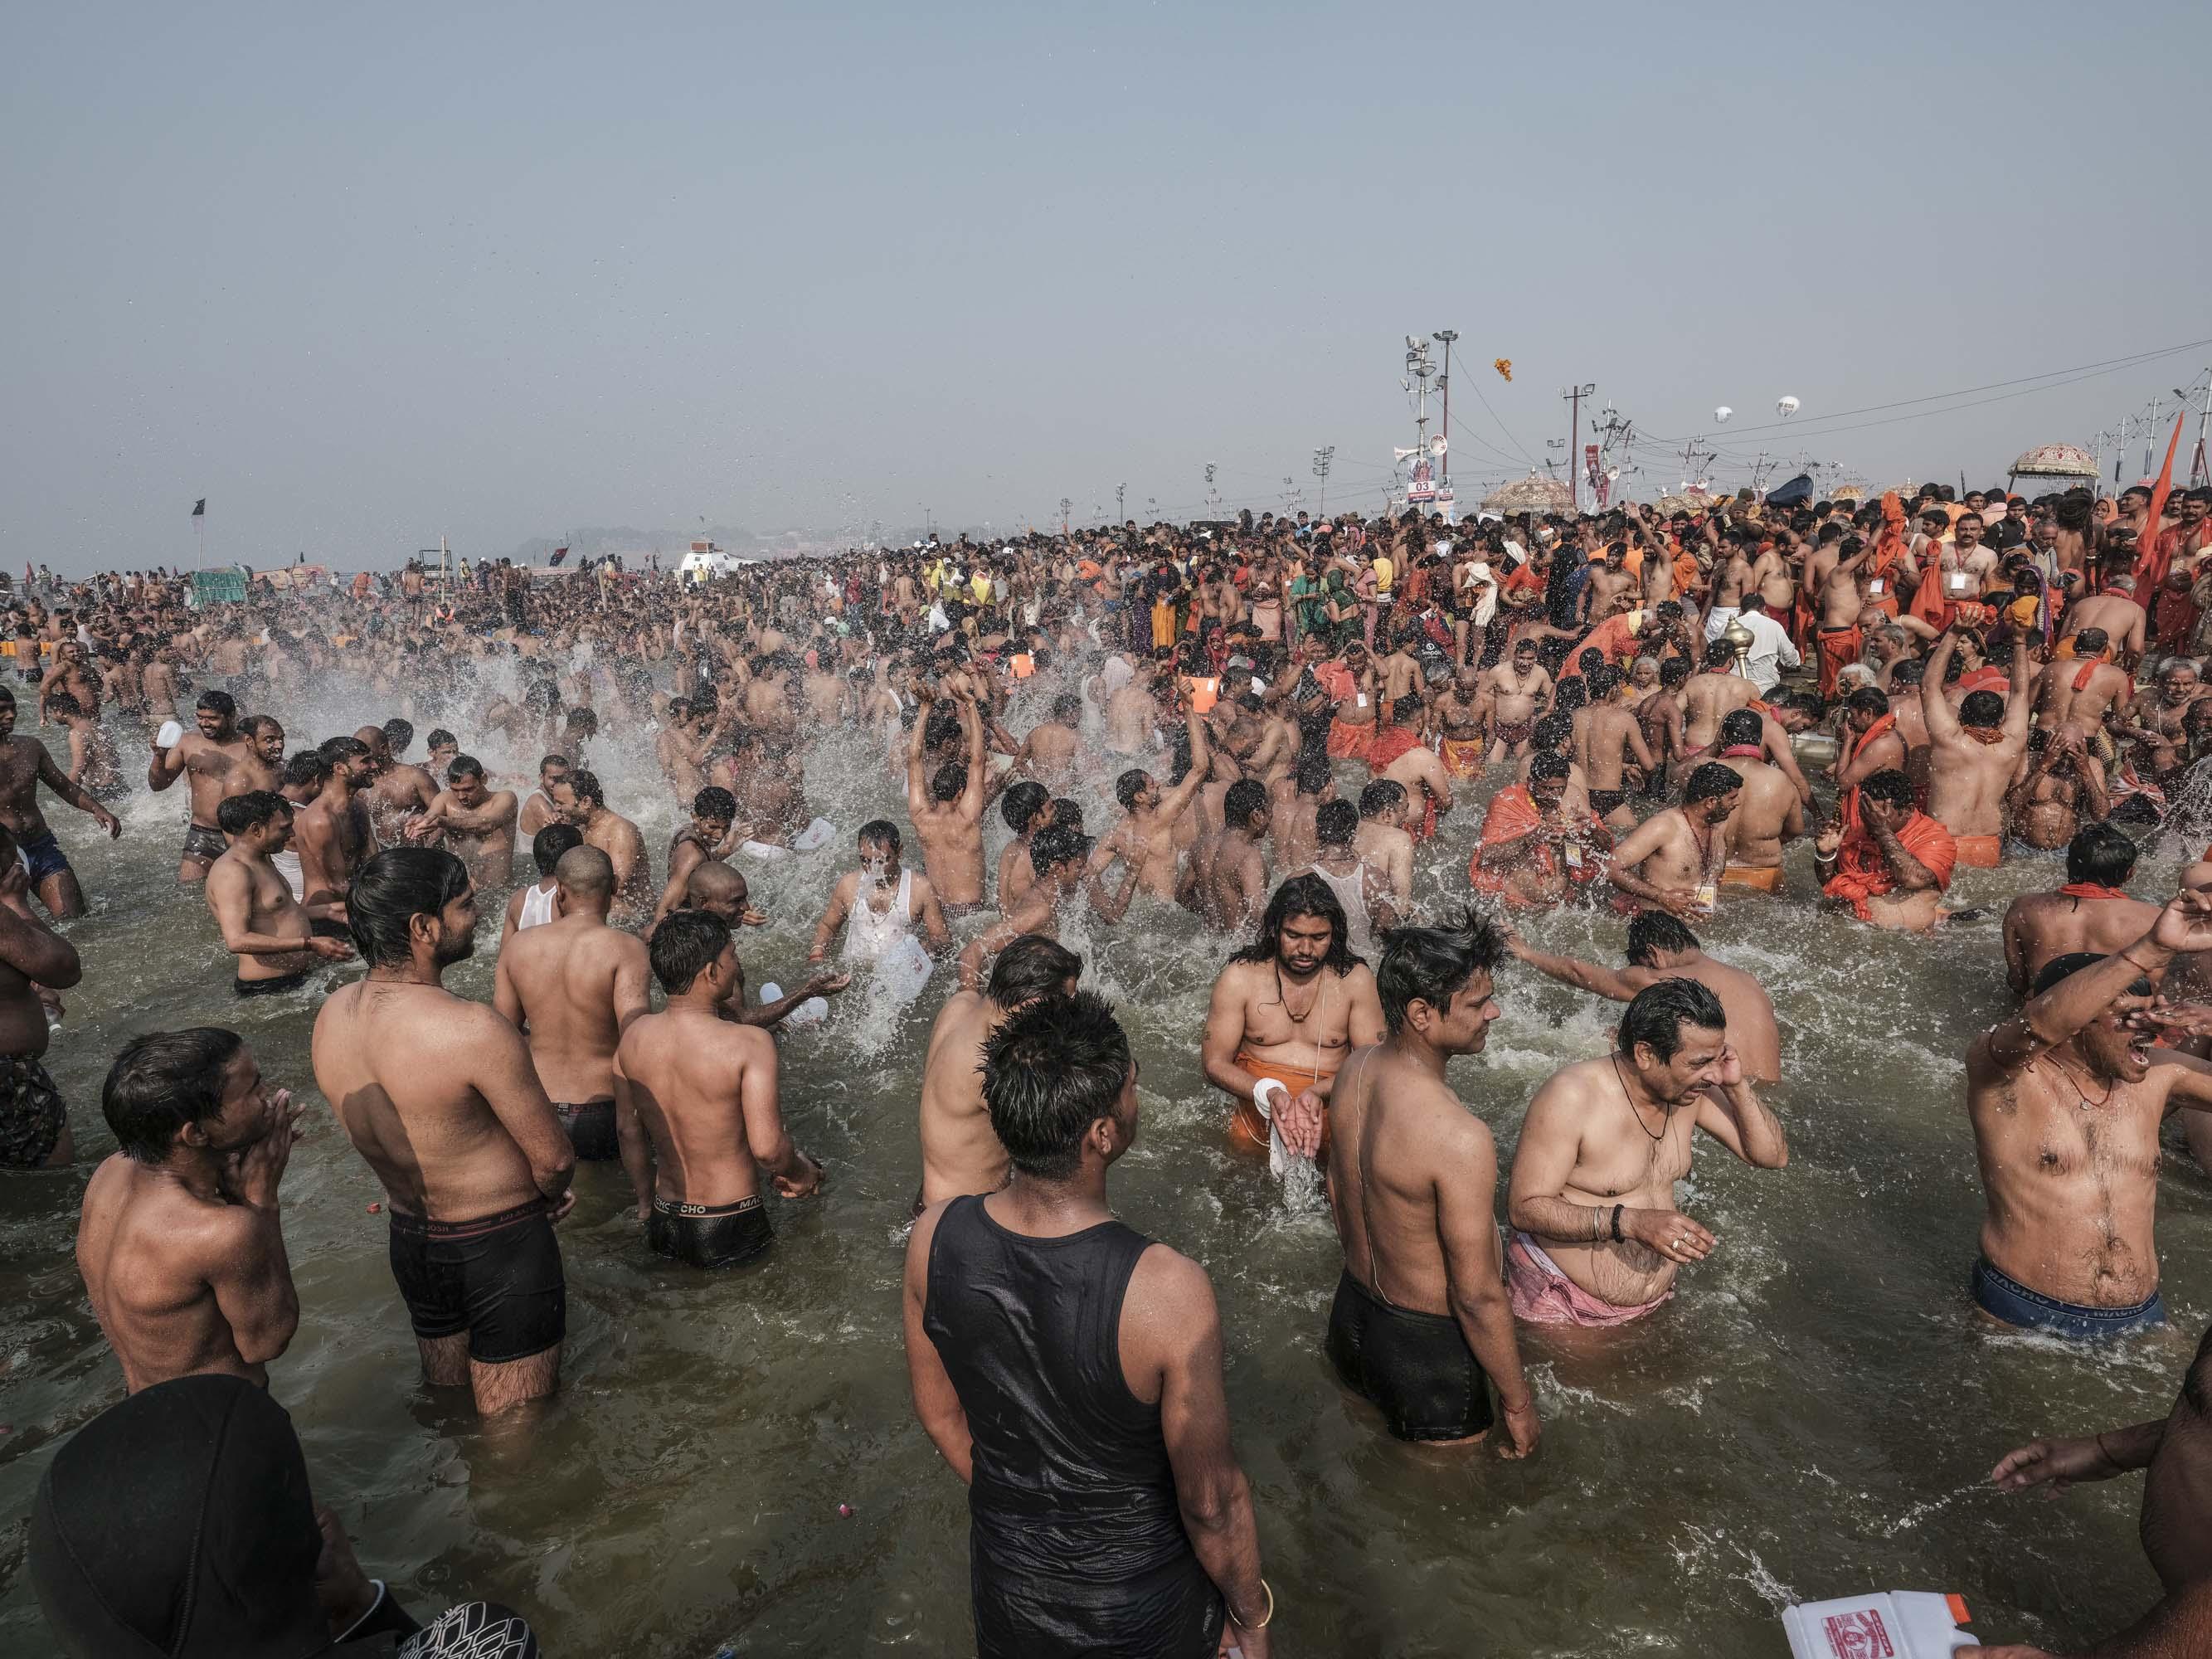 water splash bath crowd 4 February pilgrims Kumbh mela 2019 India Allahabad Prayagraj Ardh hindu religious Festival event rivers photographer jose jeuland photography